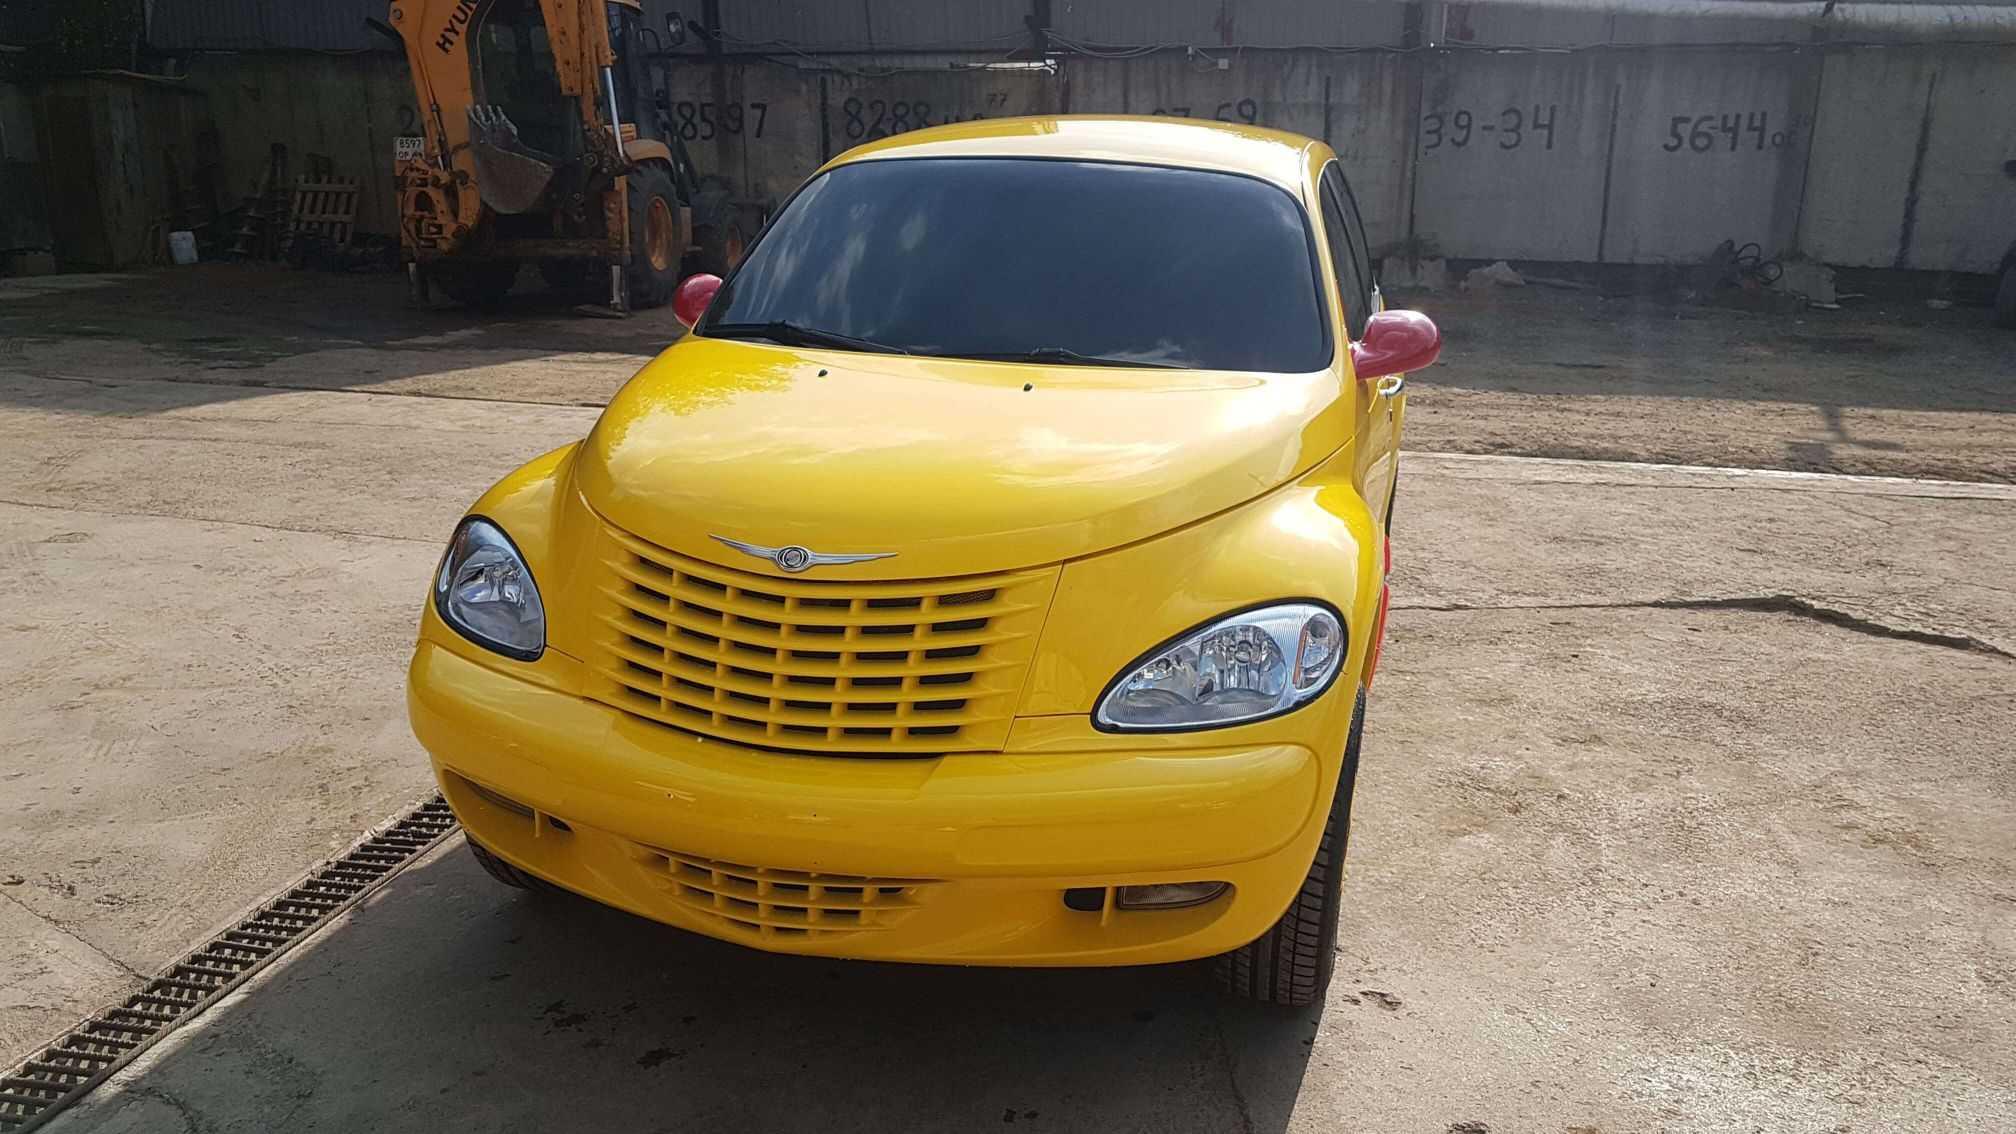 Крайслер pt cruiser полная покраска автомобиля